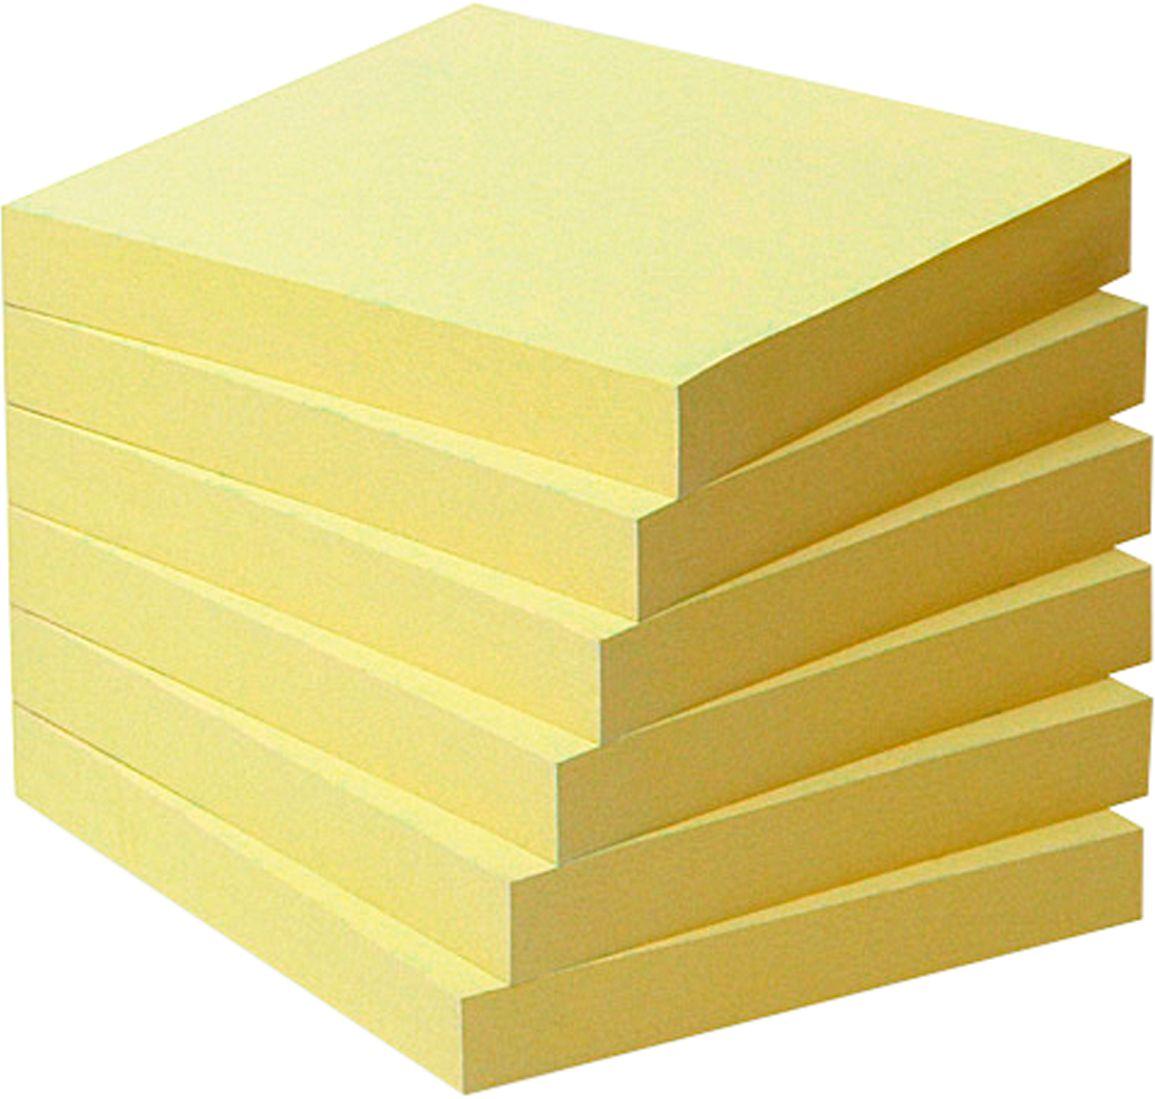 post it haftnotizen recycling papier gelb g nstig kaufen sch fer shop. Black Bedroom Furniture Sets. Home Design Ideas